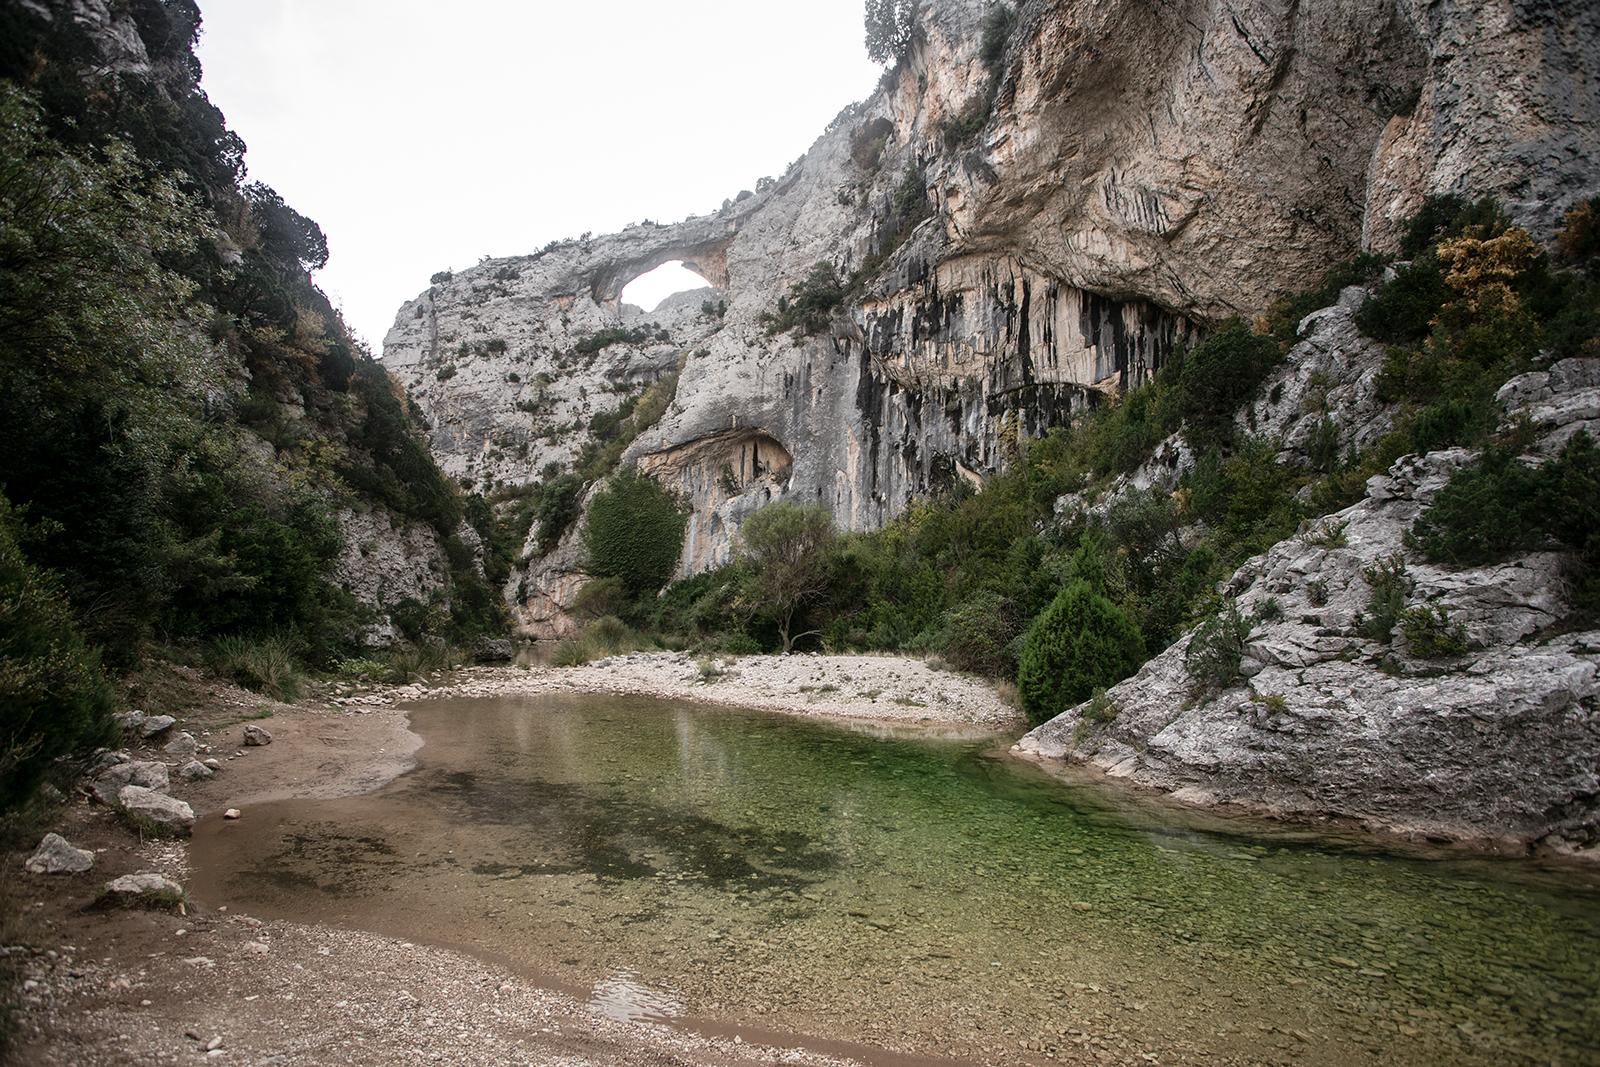 Marche d'approche Rodellar canyon mascun